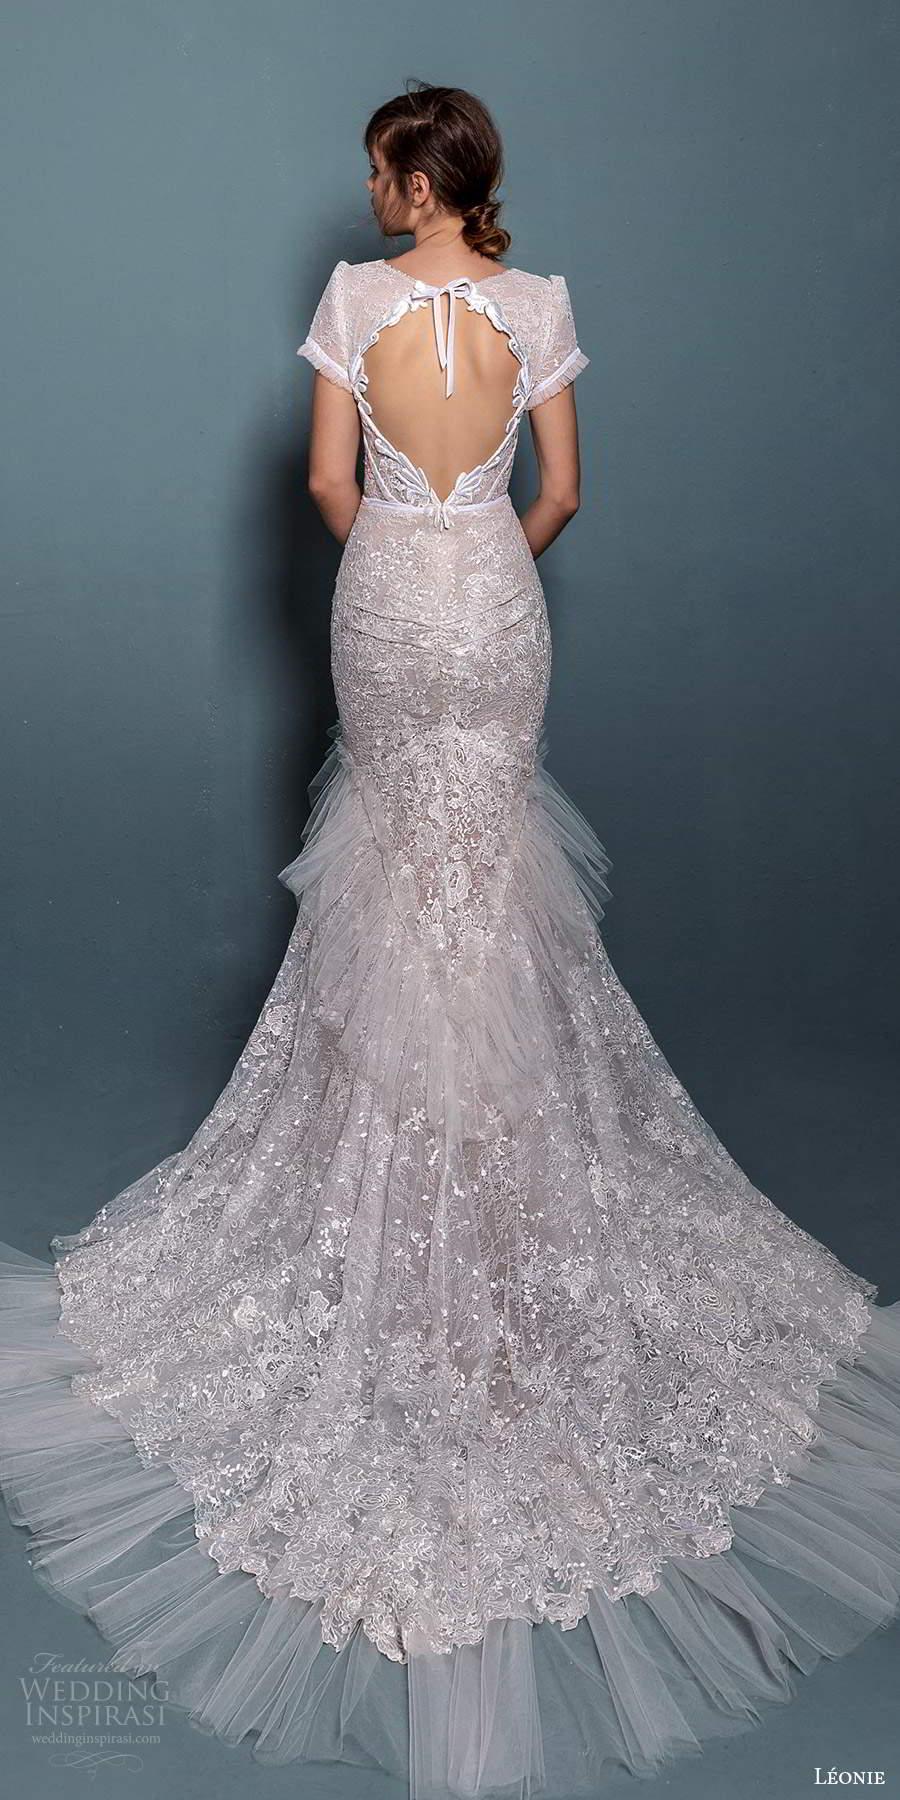 leonie bridal 2020 bridal short sleeves plunging v neckline fully embellished lace fit flare mermaid wedding dress chapel train keyhole back (4) bv